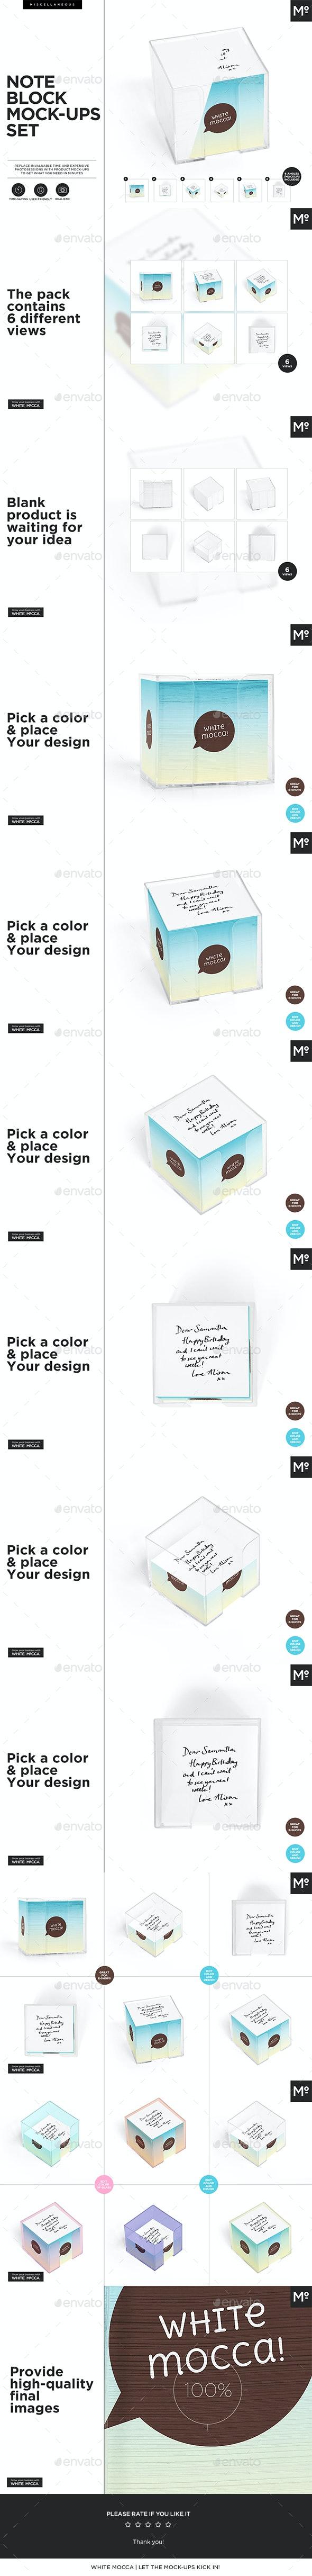 Note Block Mock-ups Set - Miscellaneous Print